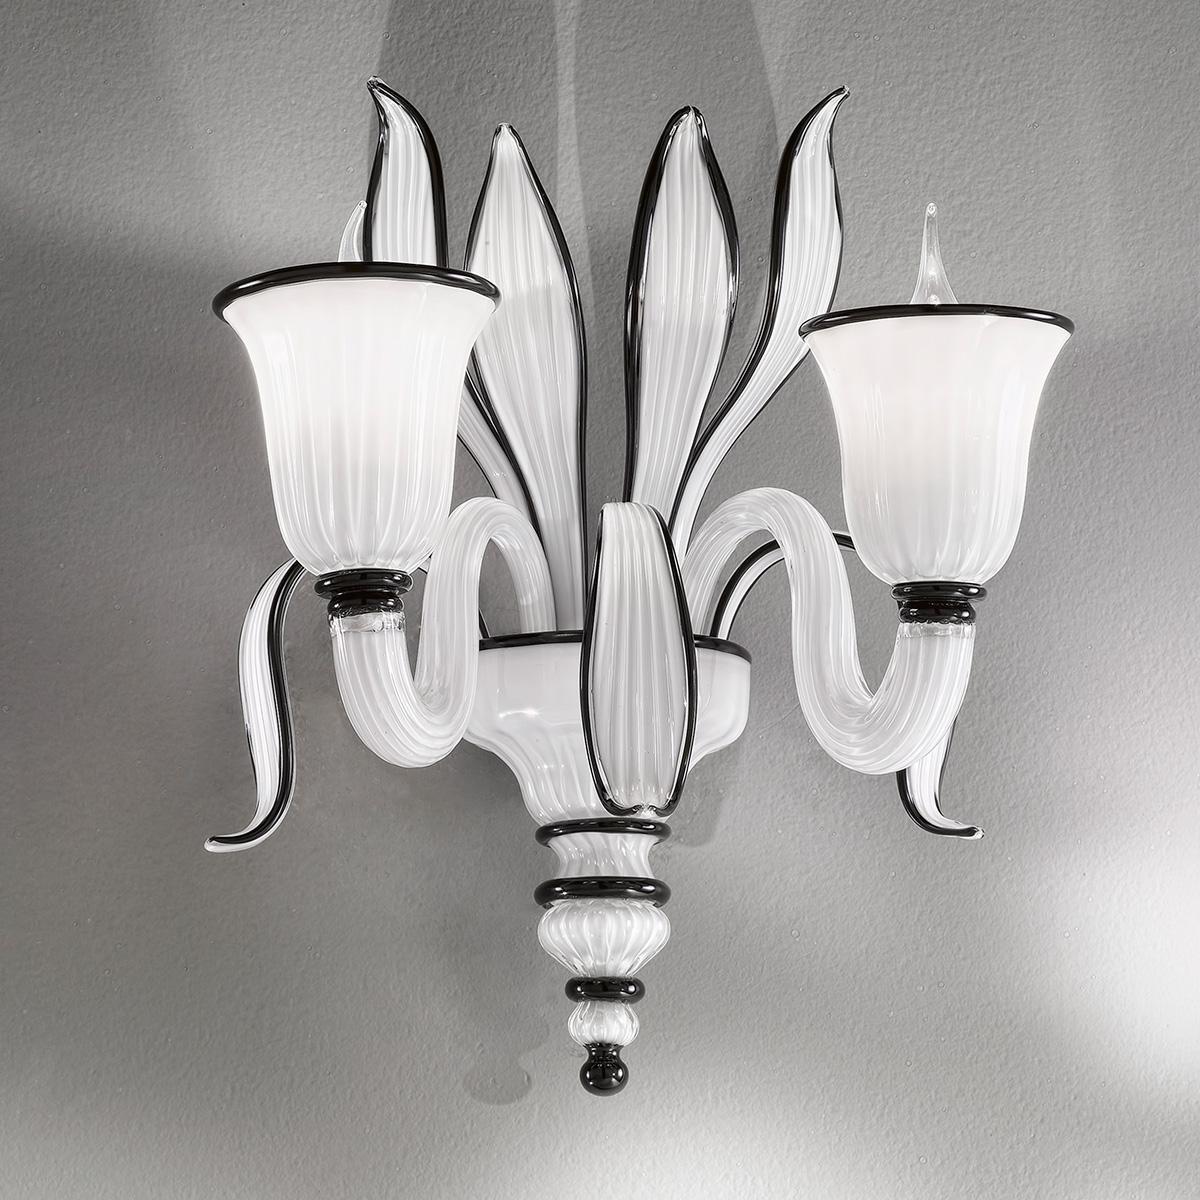 """Linda"" Murano glass sconce - 2 lights - white and black"